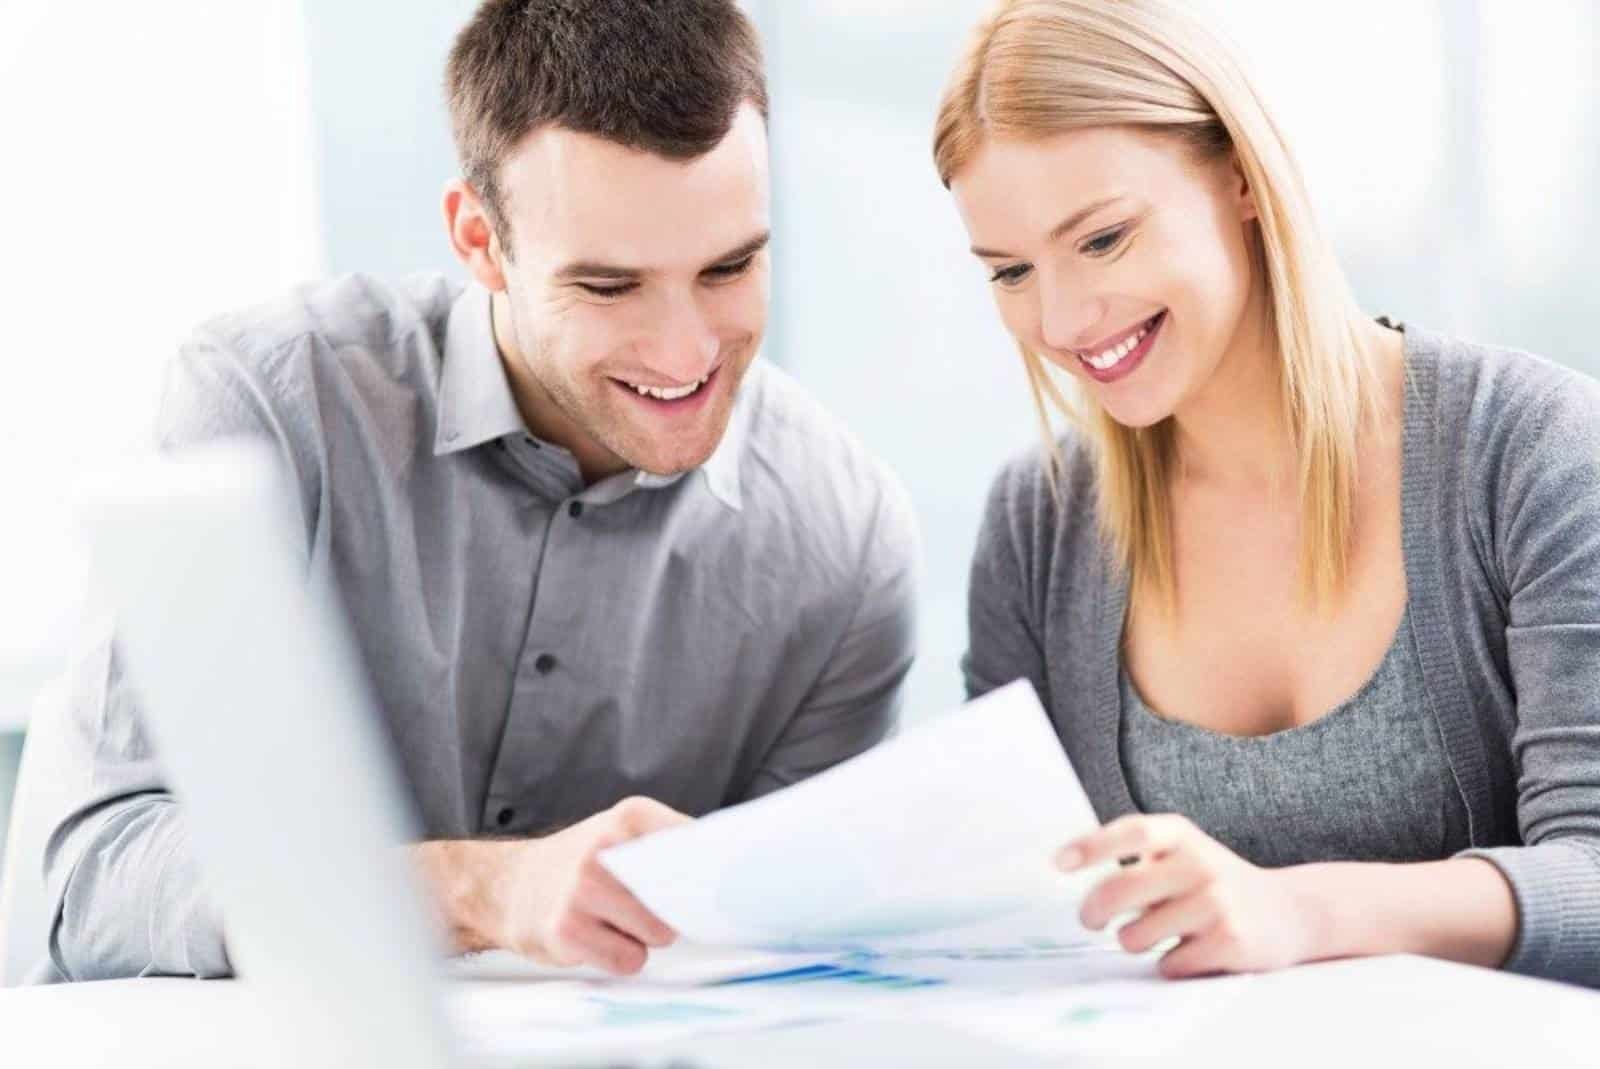 lächelndes Paar, das Papier betrachtet